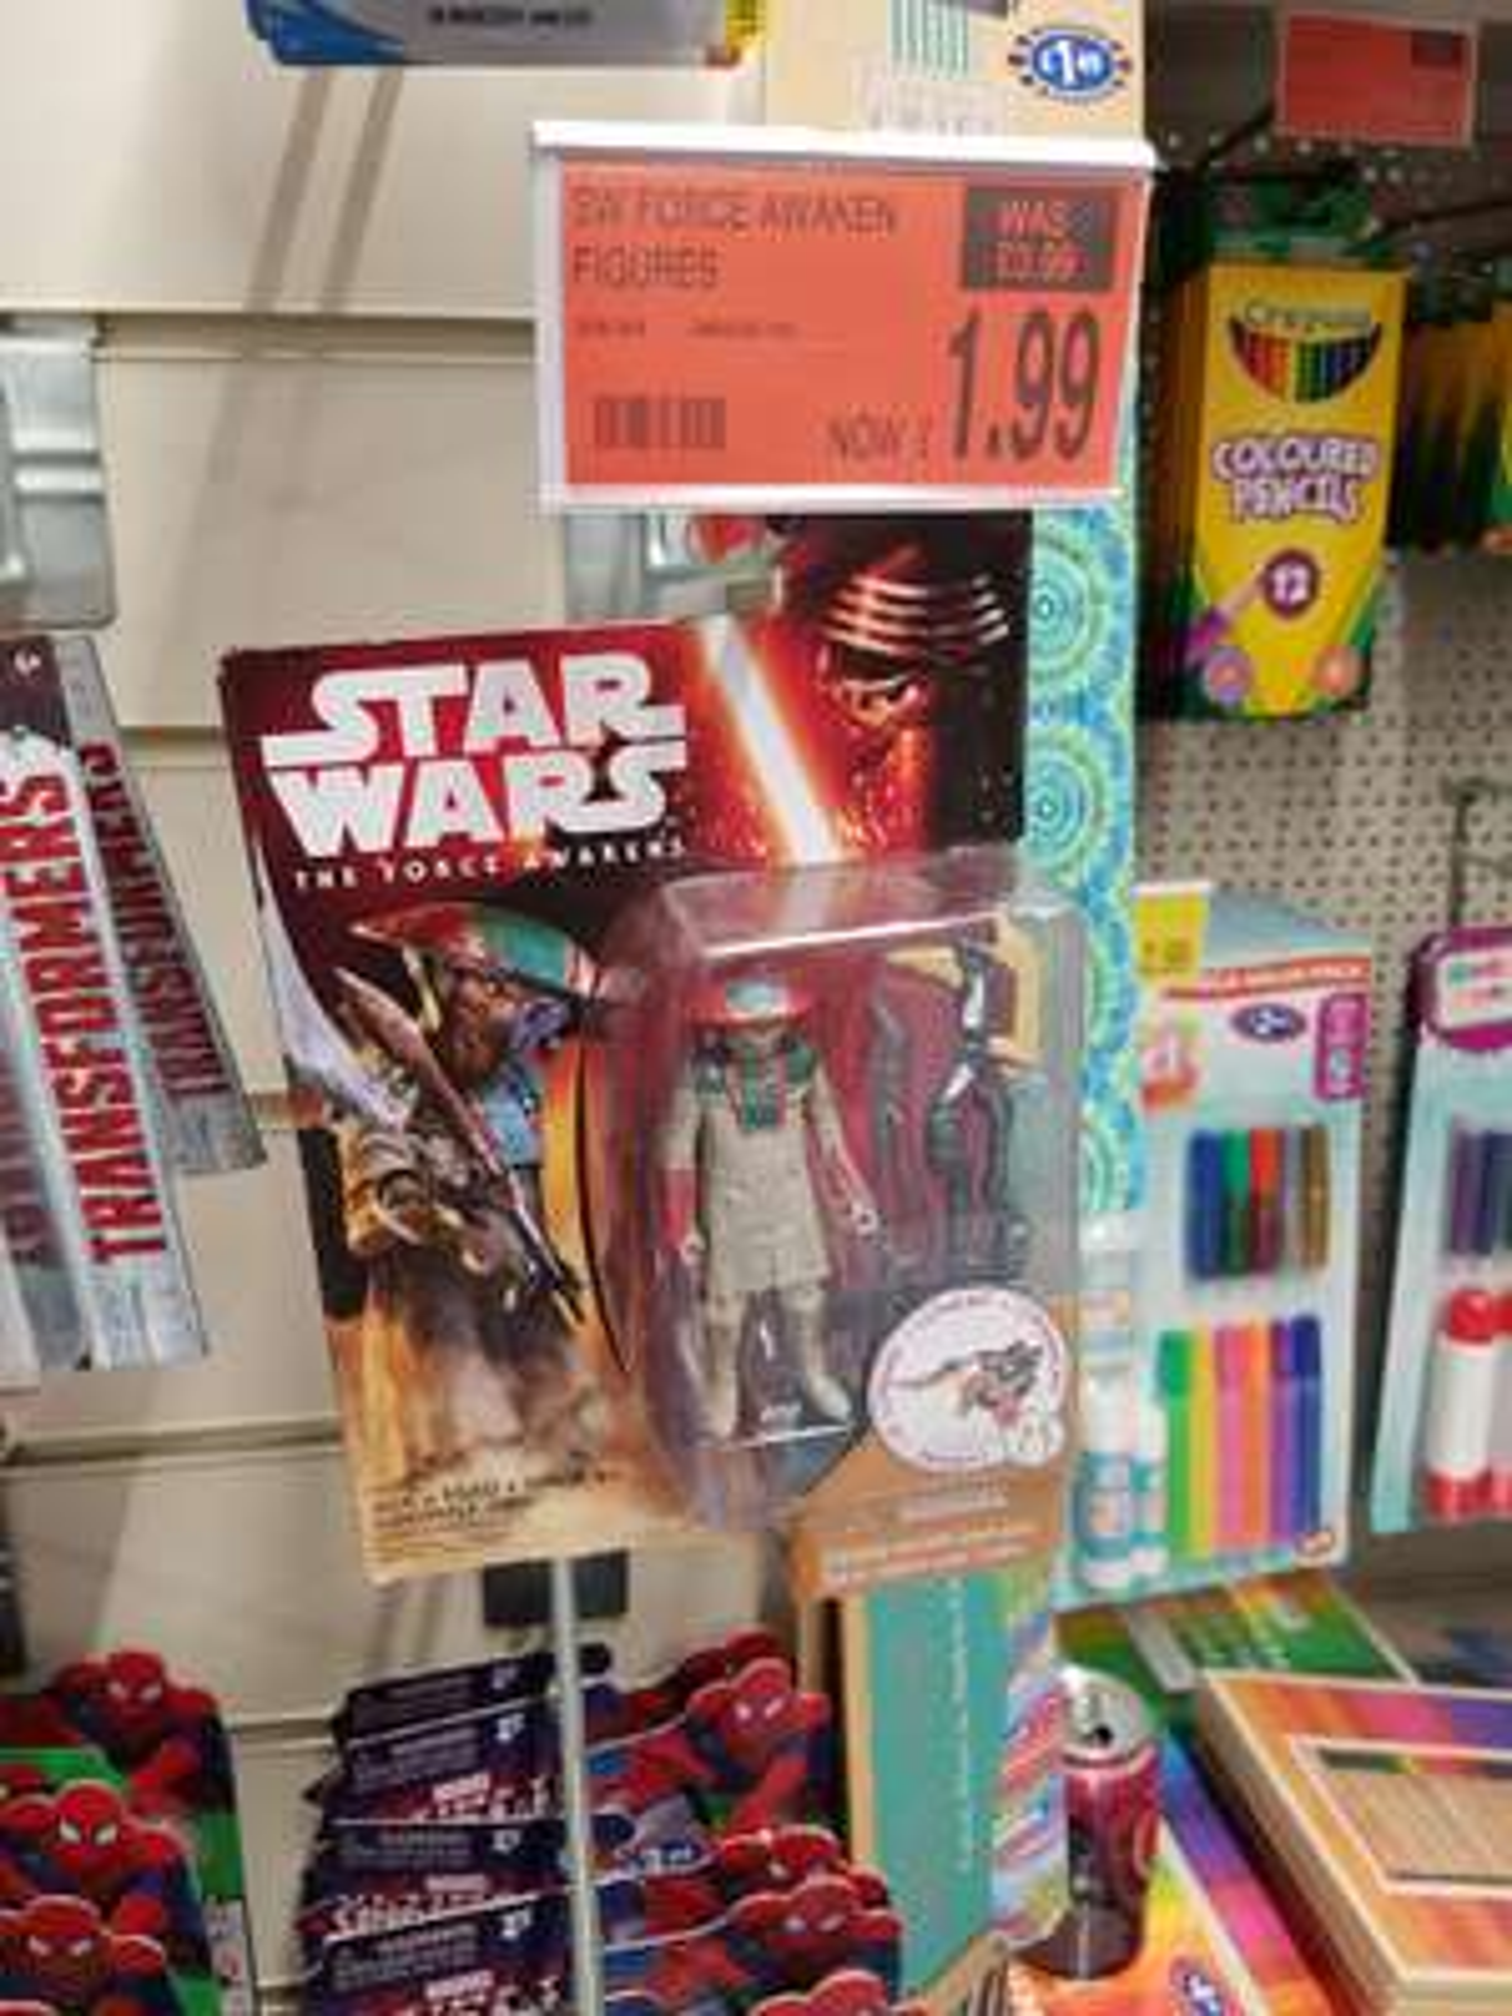 Star Wars force awakens figures £1.99 - B&M